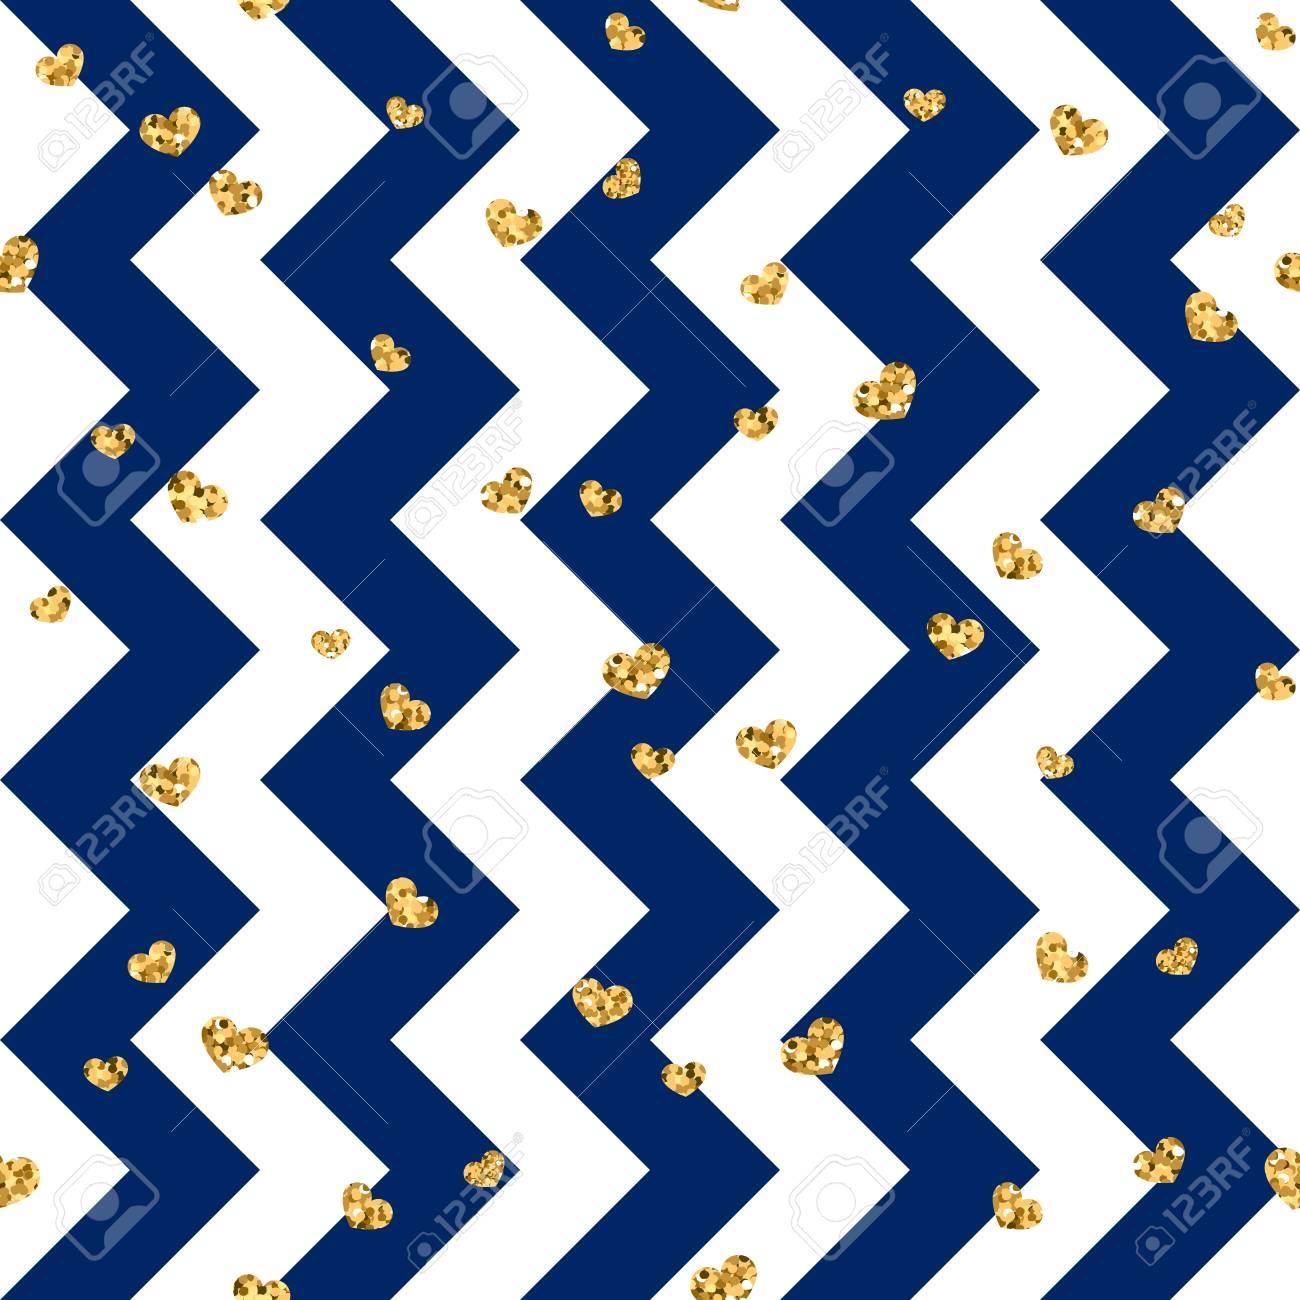 Gold Heart Seamless Pattern Blue white Geometric Zig Zag Golden 1300x1300